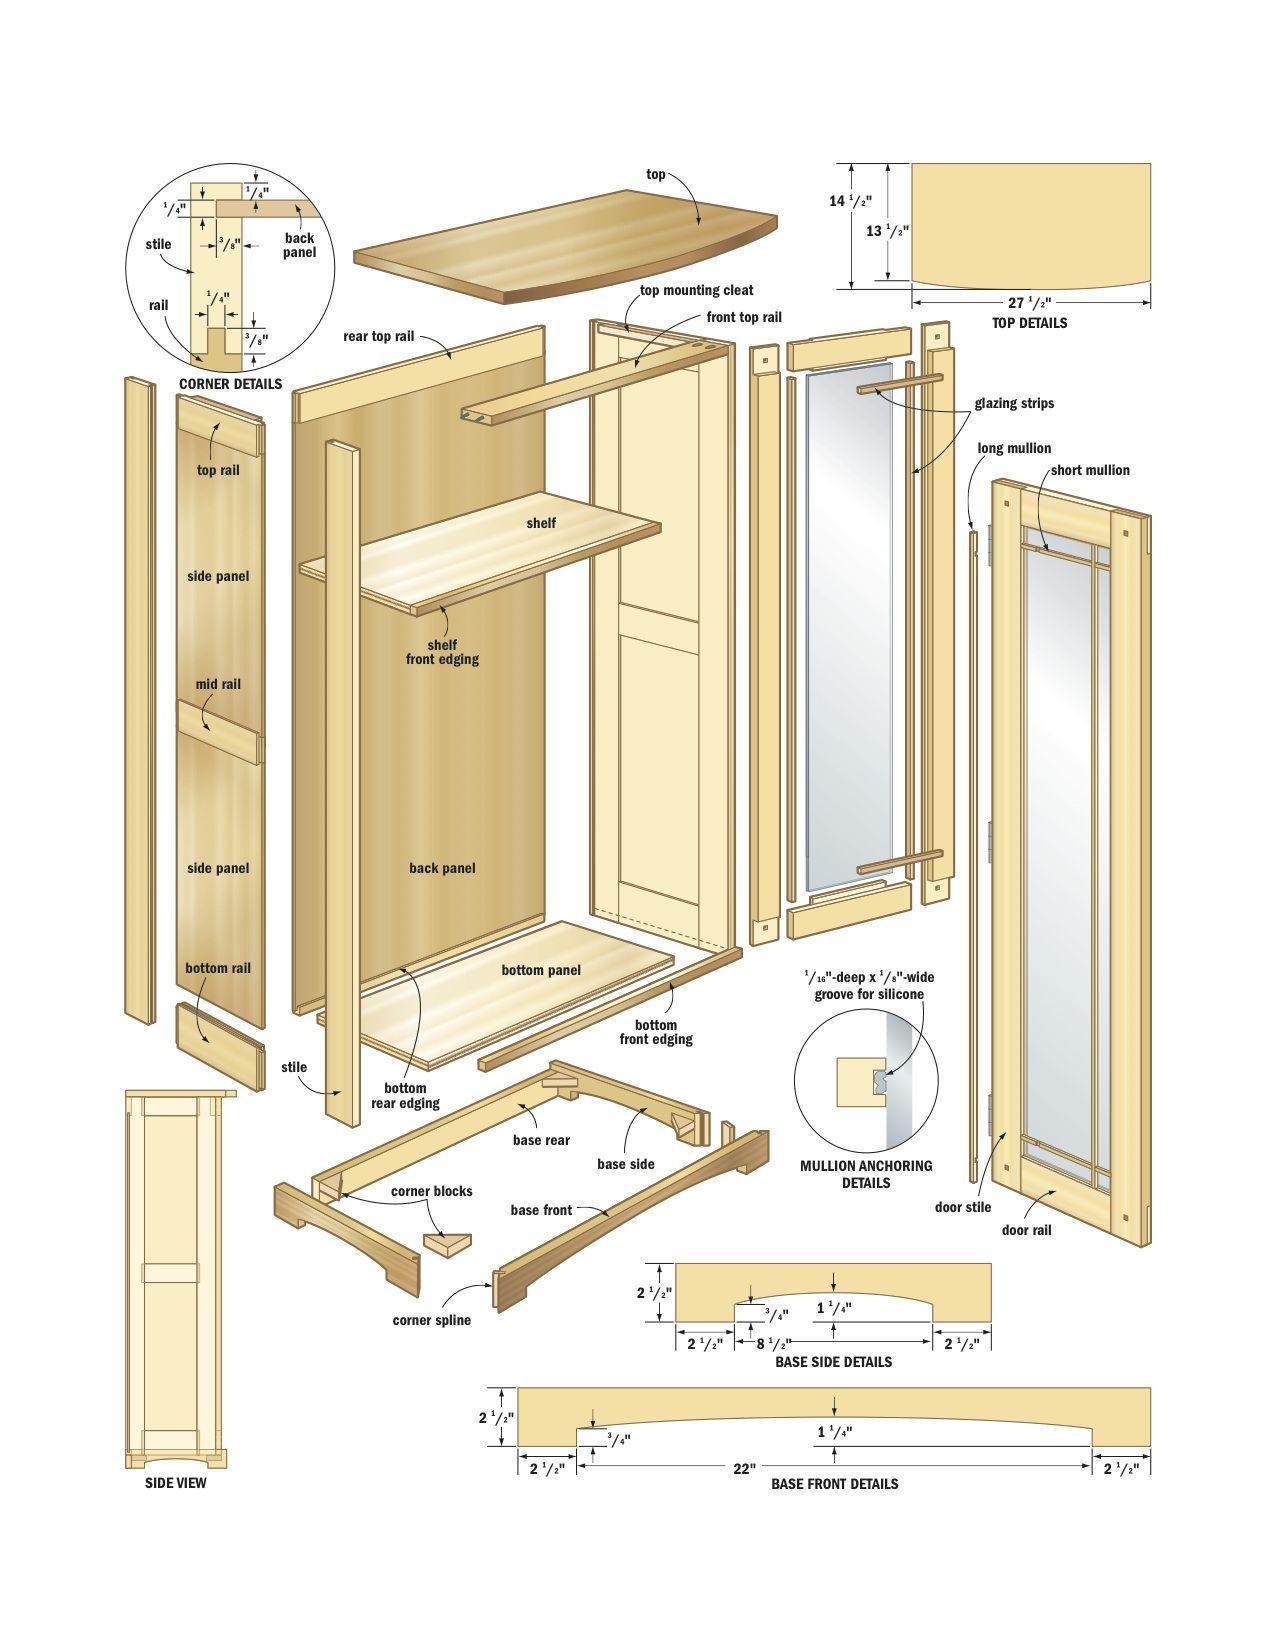 Woodwork Kitchen Cabinet Plans Woodworking Pdf Plans Plans Woodworking Furniture W In 2020 Cabinet Woodworking Plans Woodworking Projects Plans Woodworking Plans Free